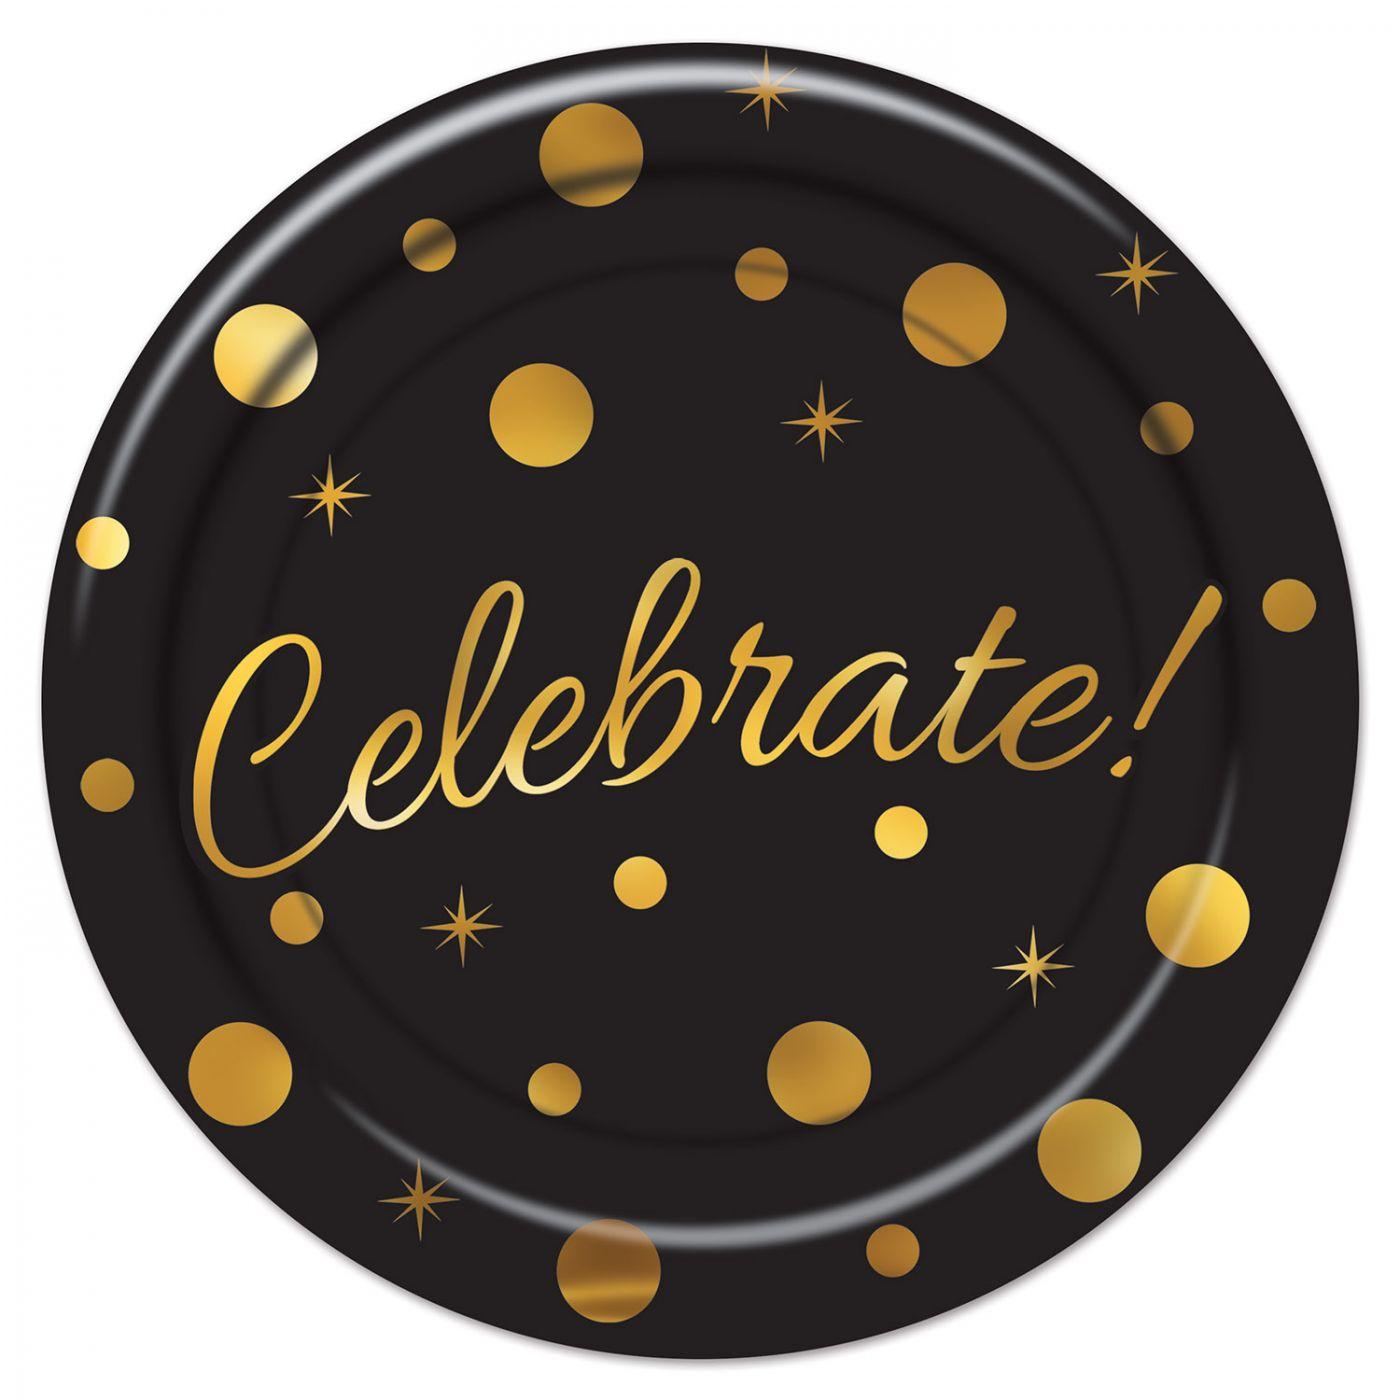 Celebrate! Plates image